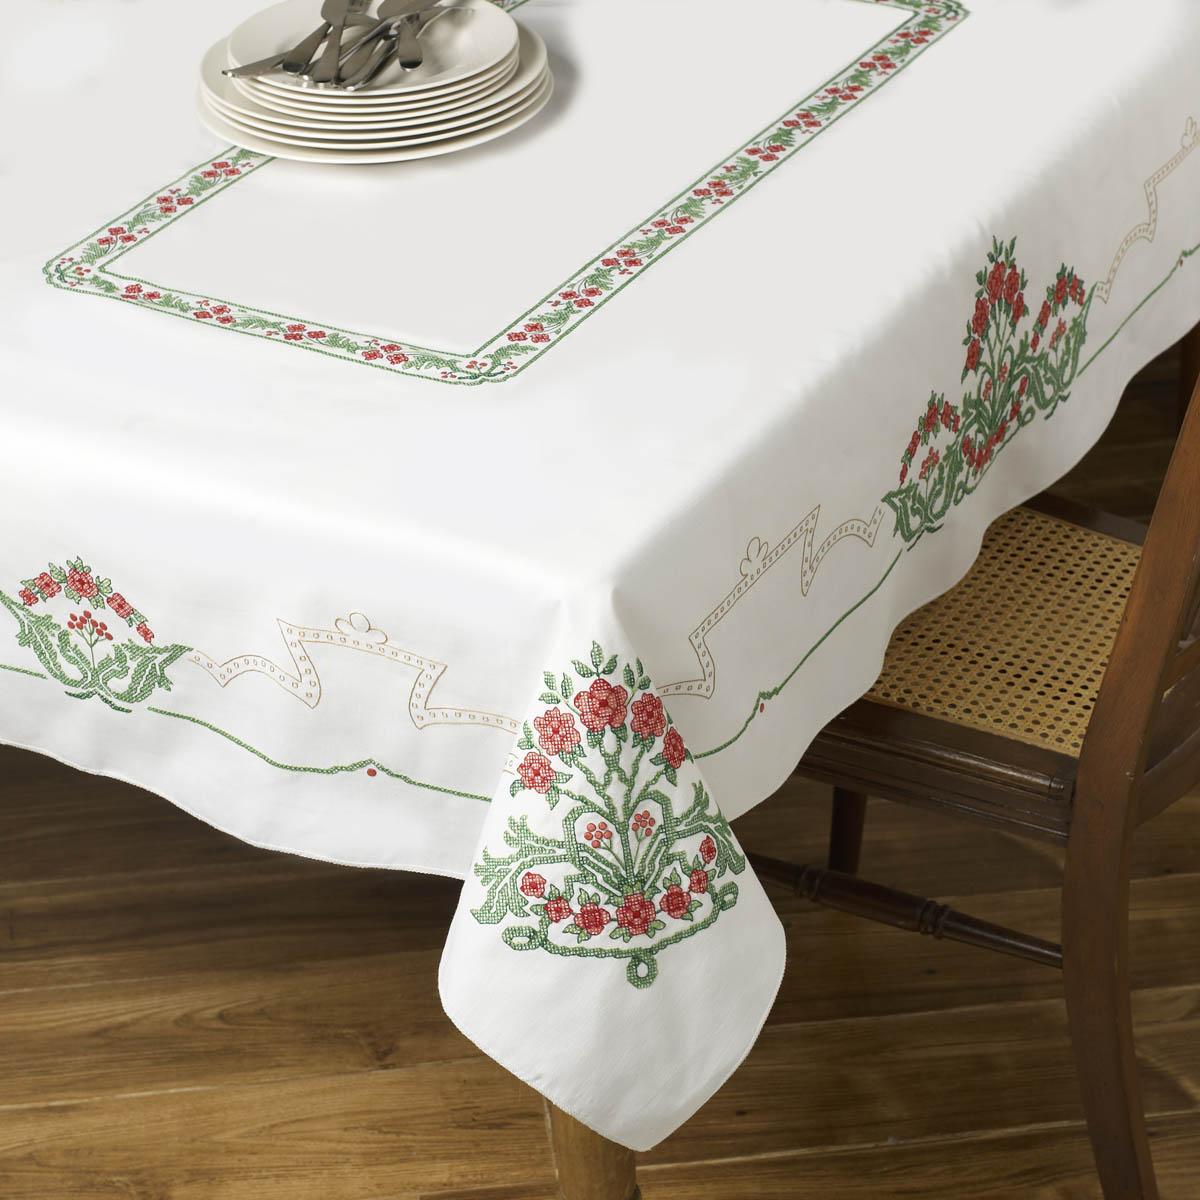 Bucilla ® Seasonal - Stamped Cross Stitch - Smithsonian ® - Table Ensembles - Victorian Frieze - Tab